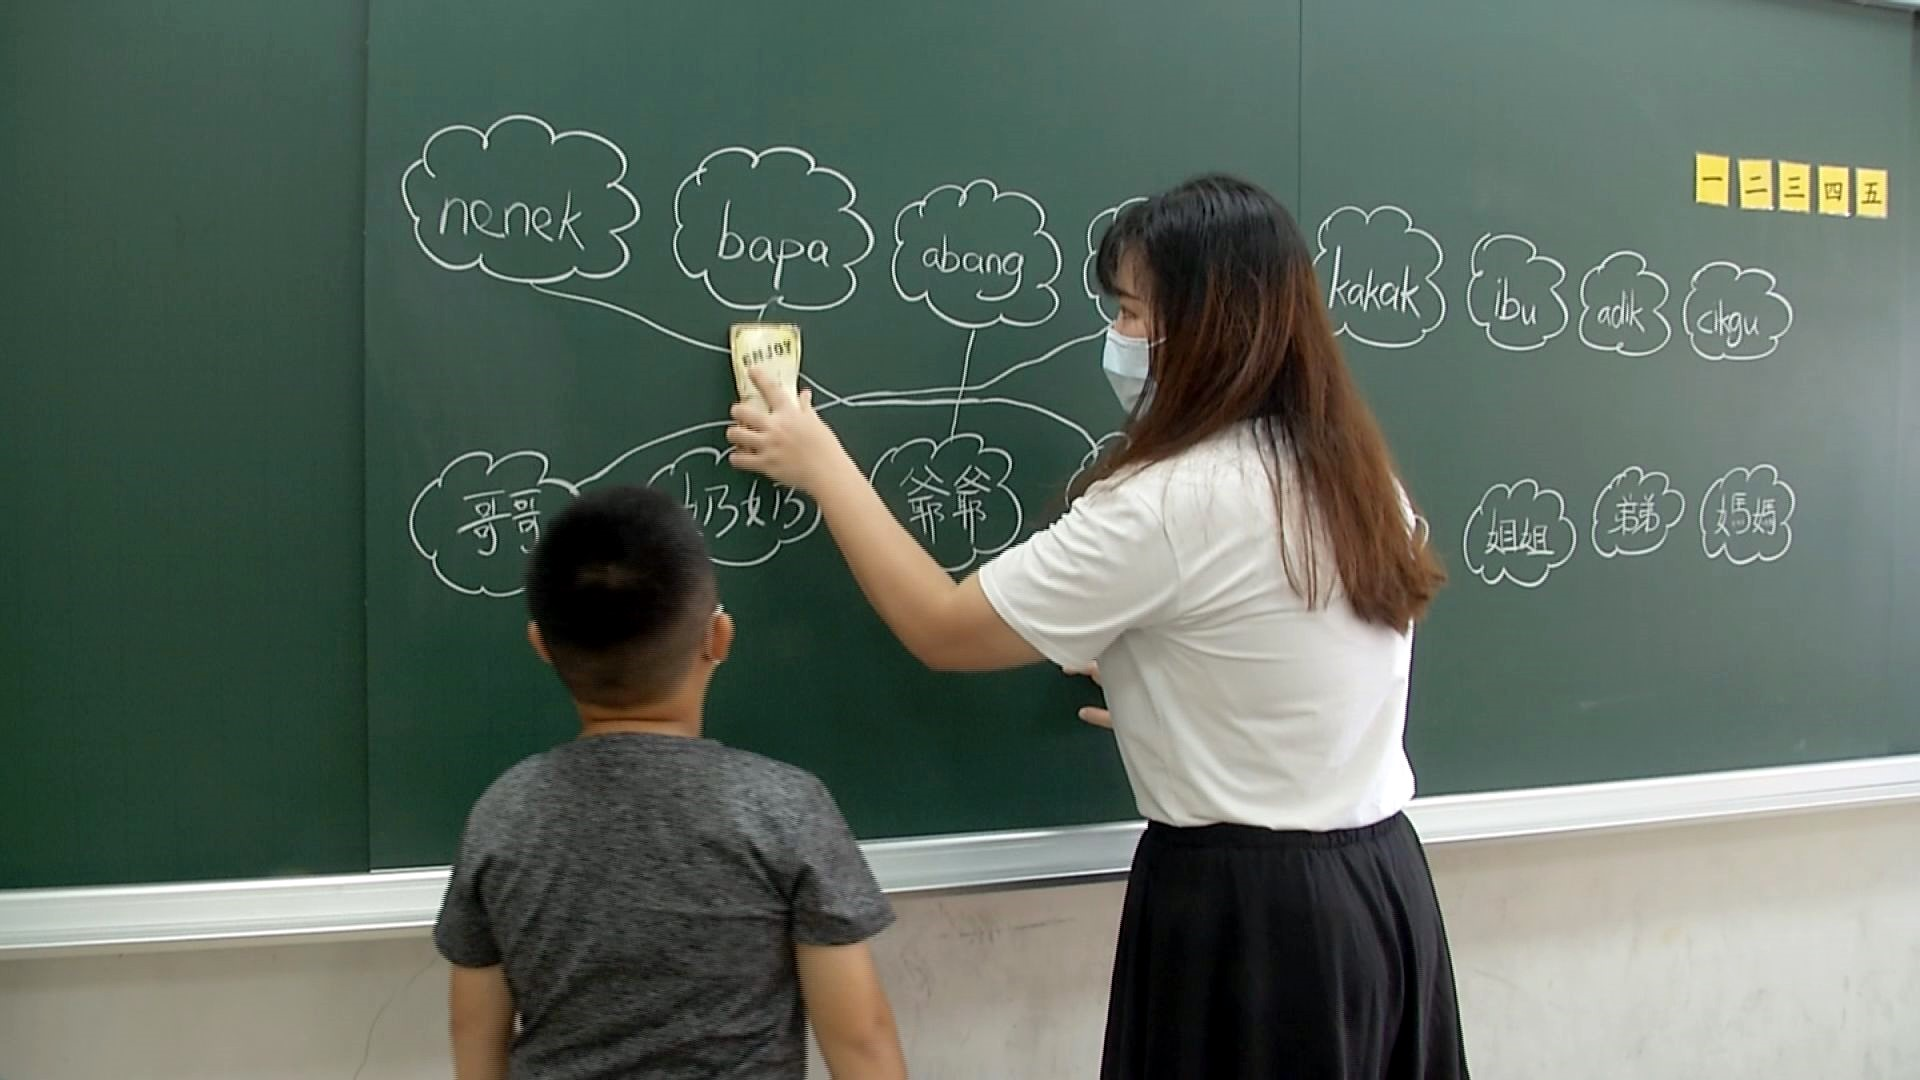 SD Taoyuan belajar bahasa Asia Tenggara melalui permainan